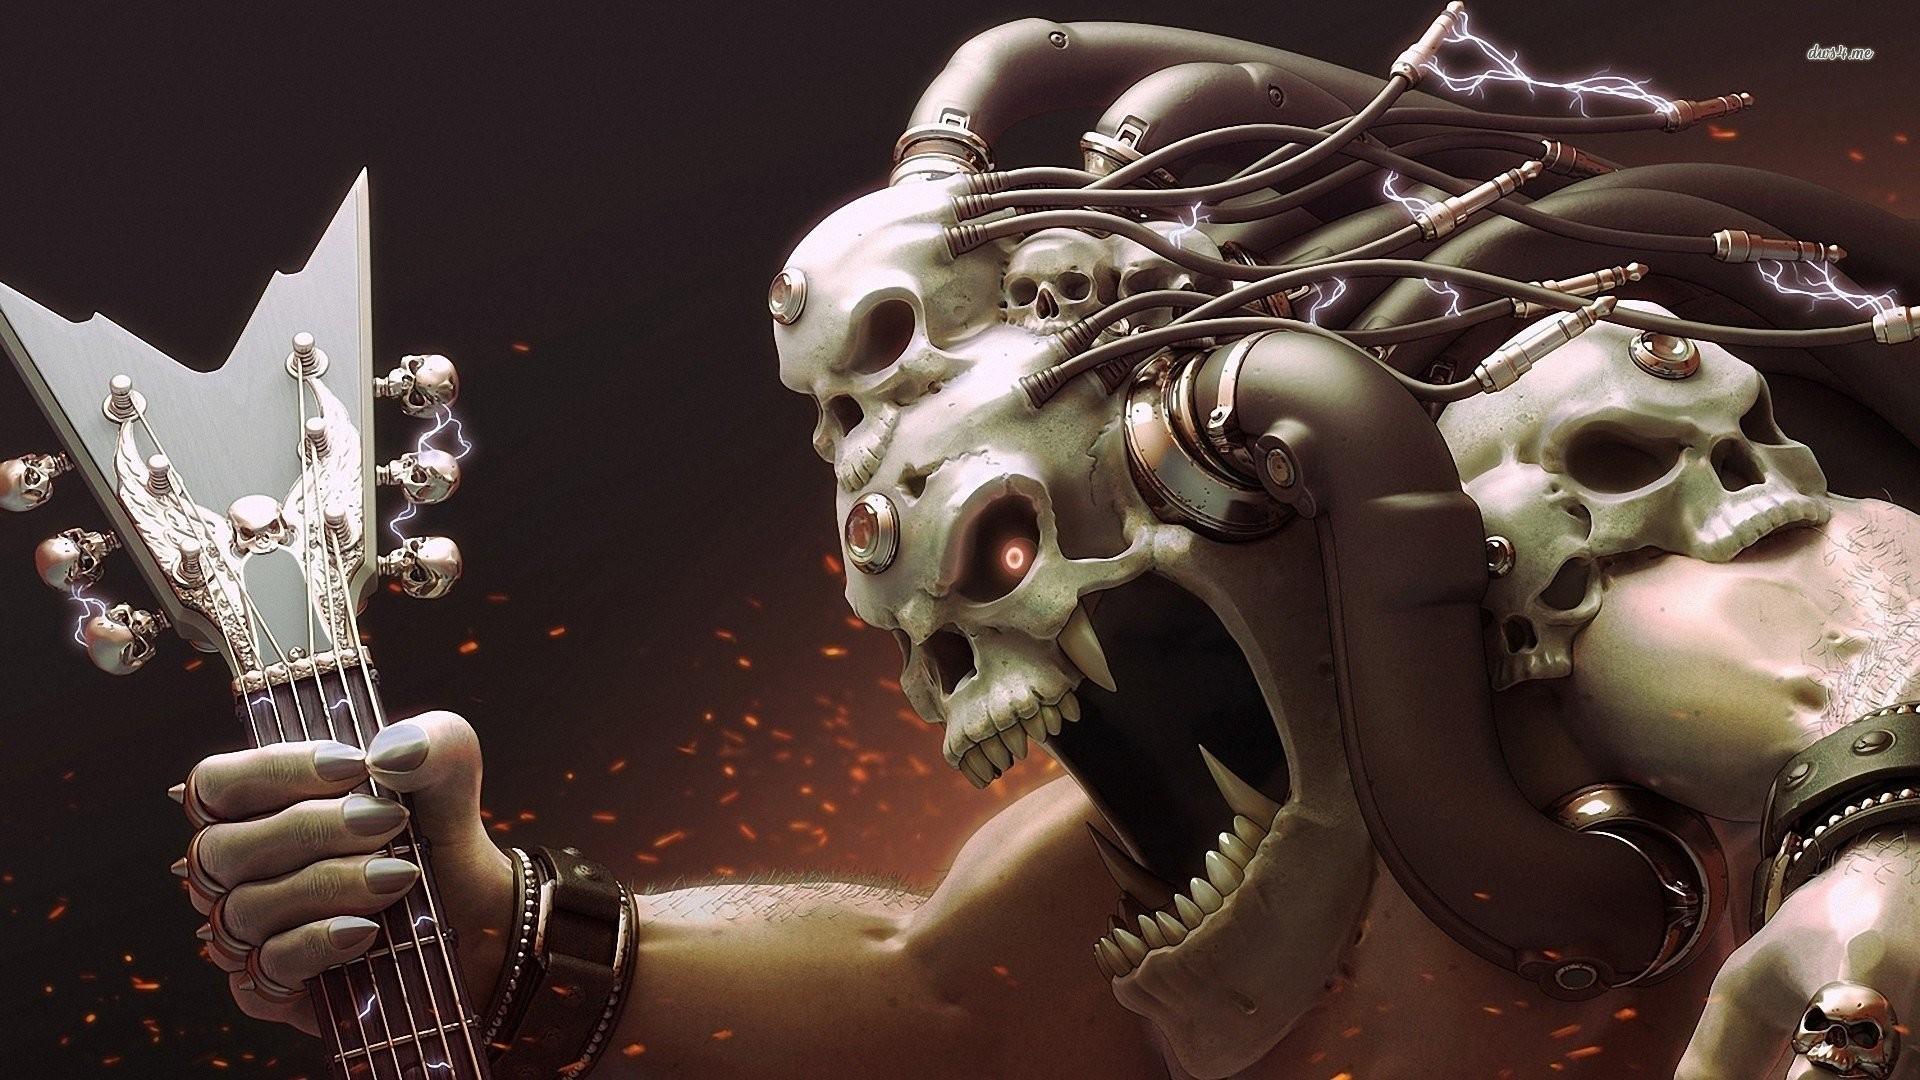 Halloween Skeleton Wallpaper.Skeletons Wallpapers 54 Images